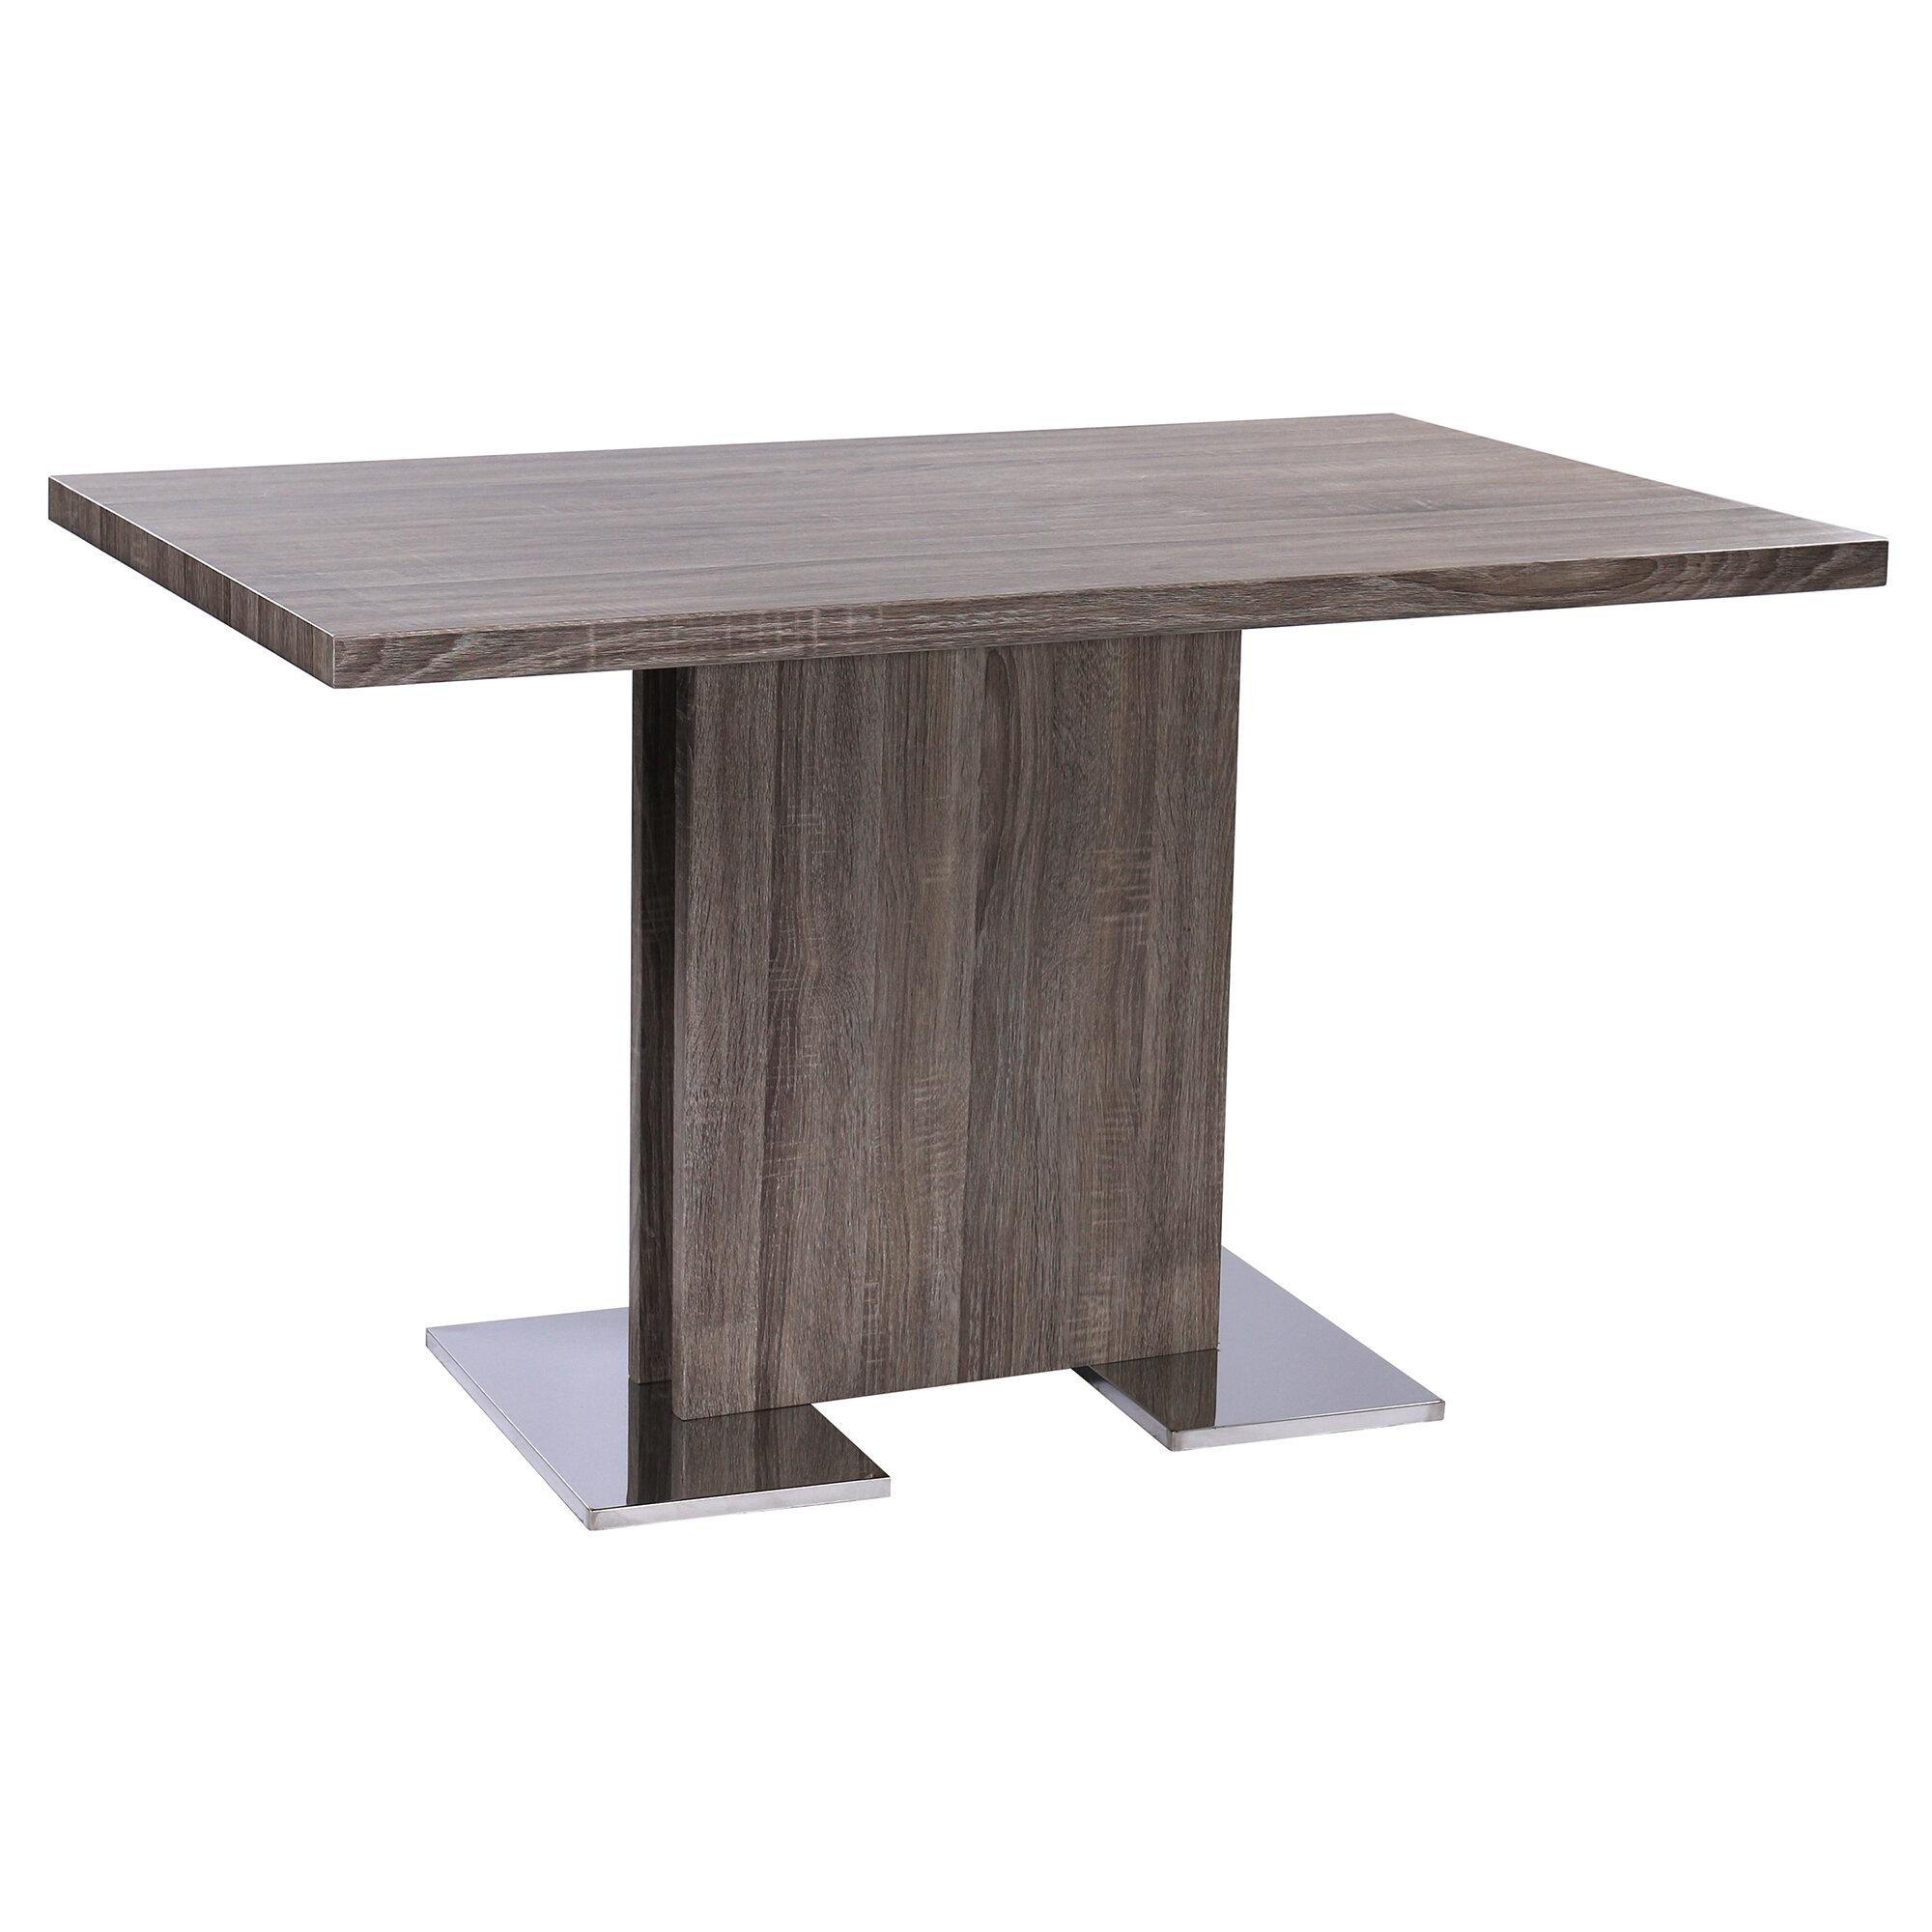 Orren ellis holder contemporary dining table wayfair